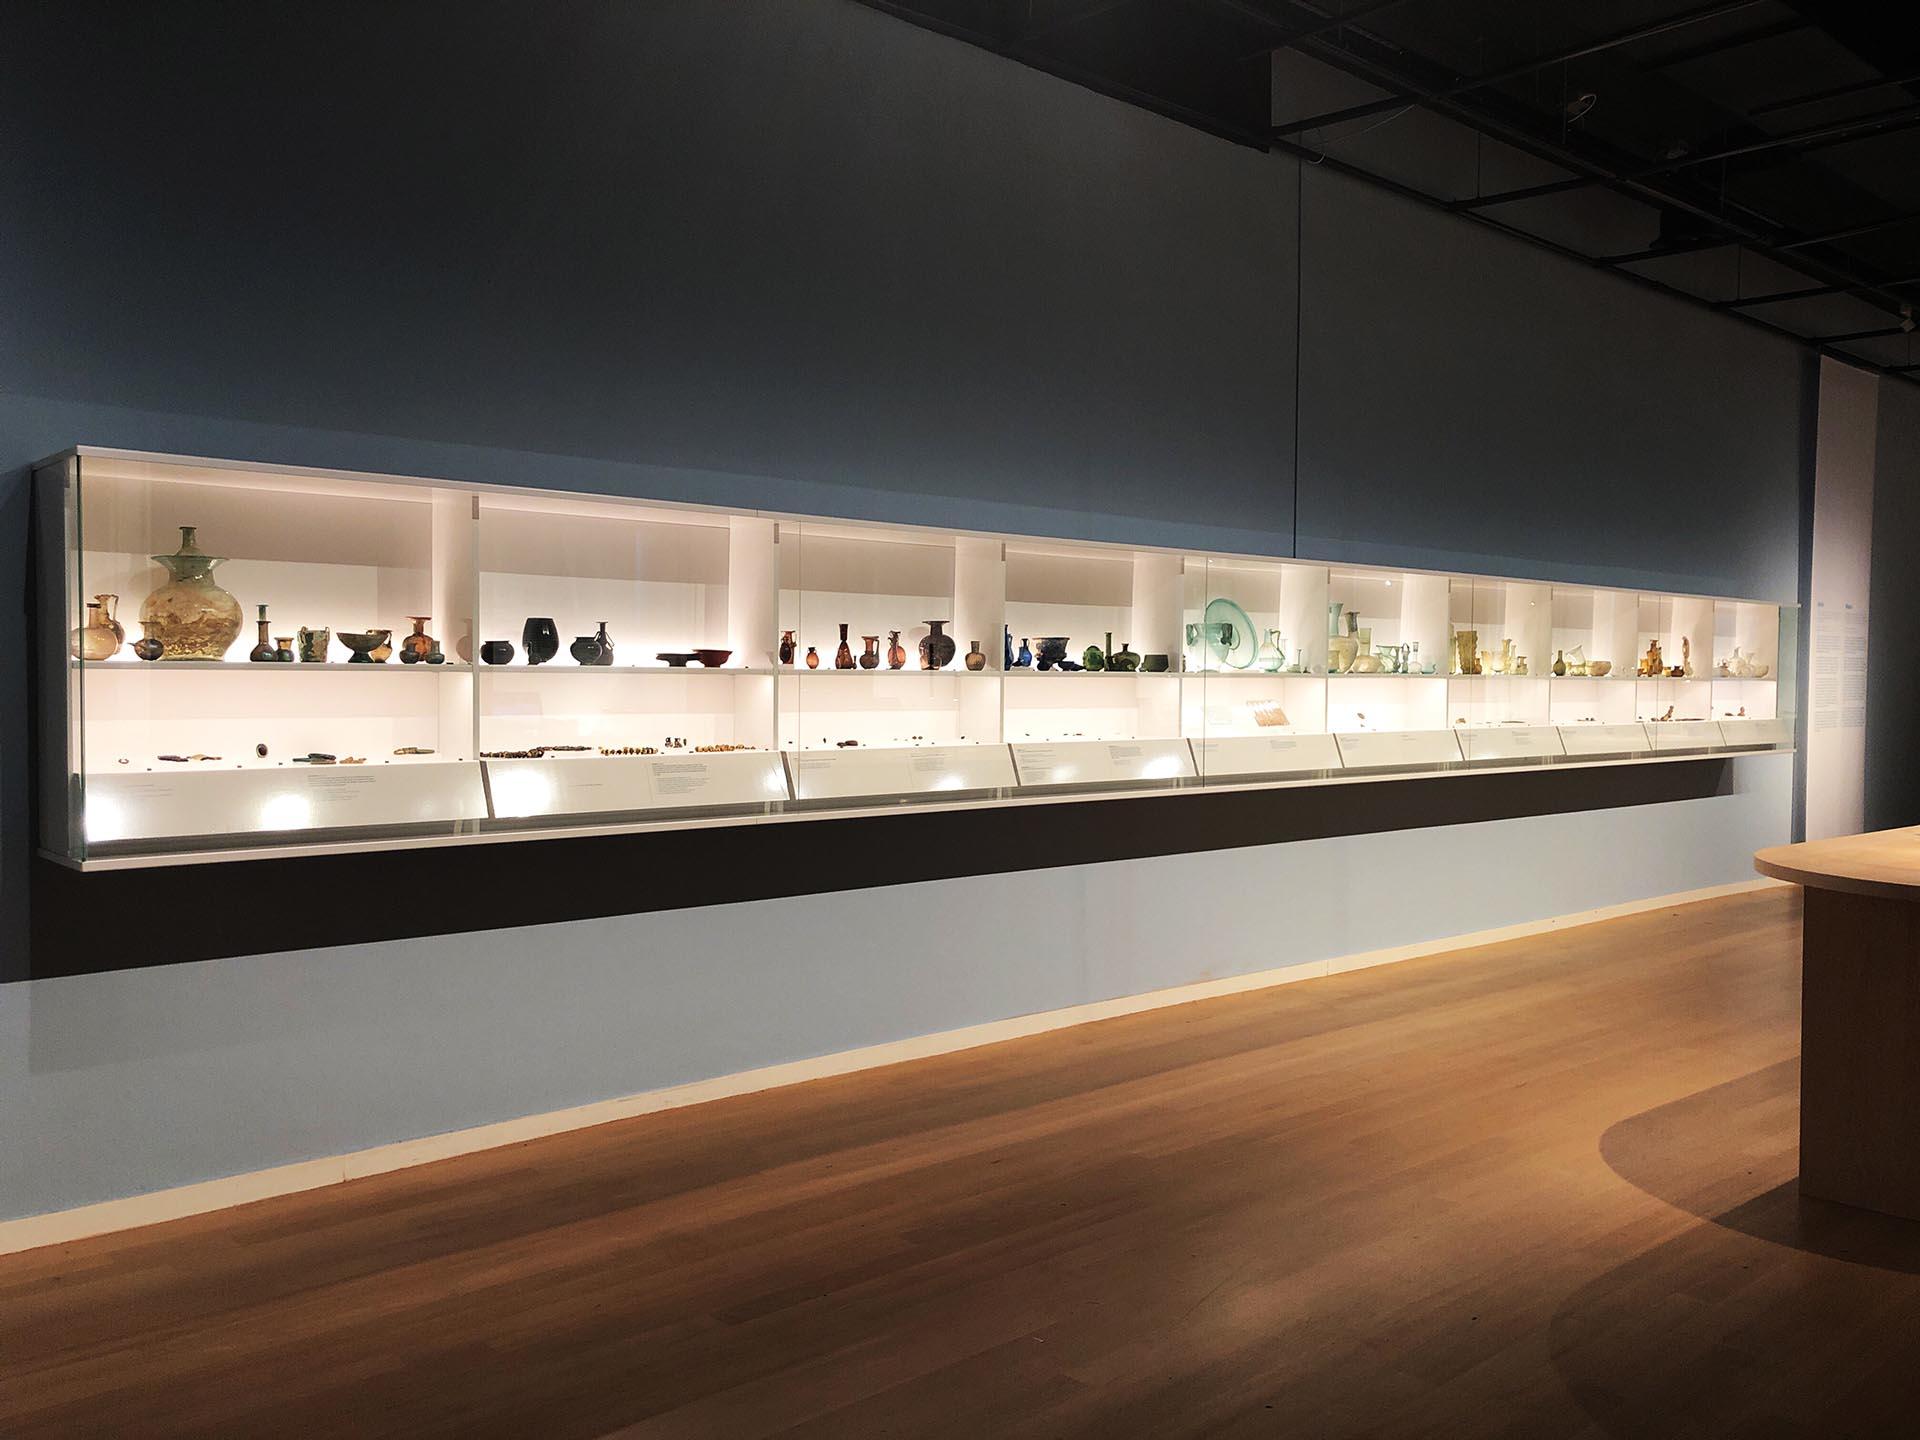 Glas Tentoonstelling RMO Leiden